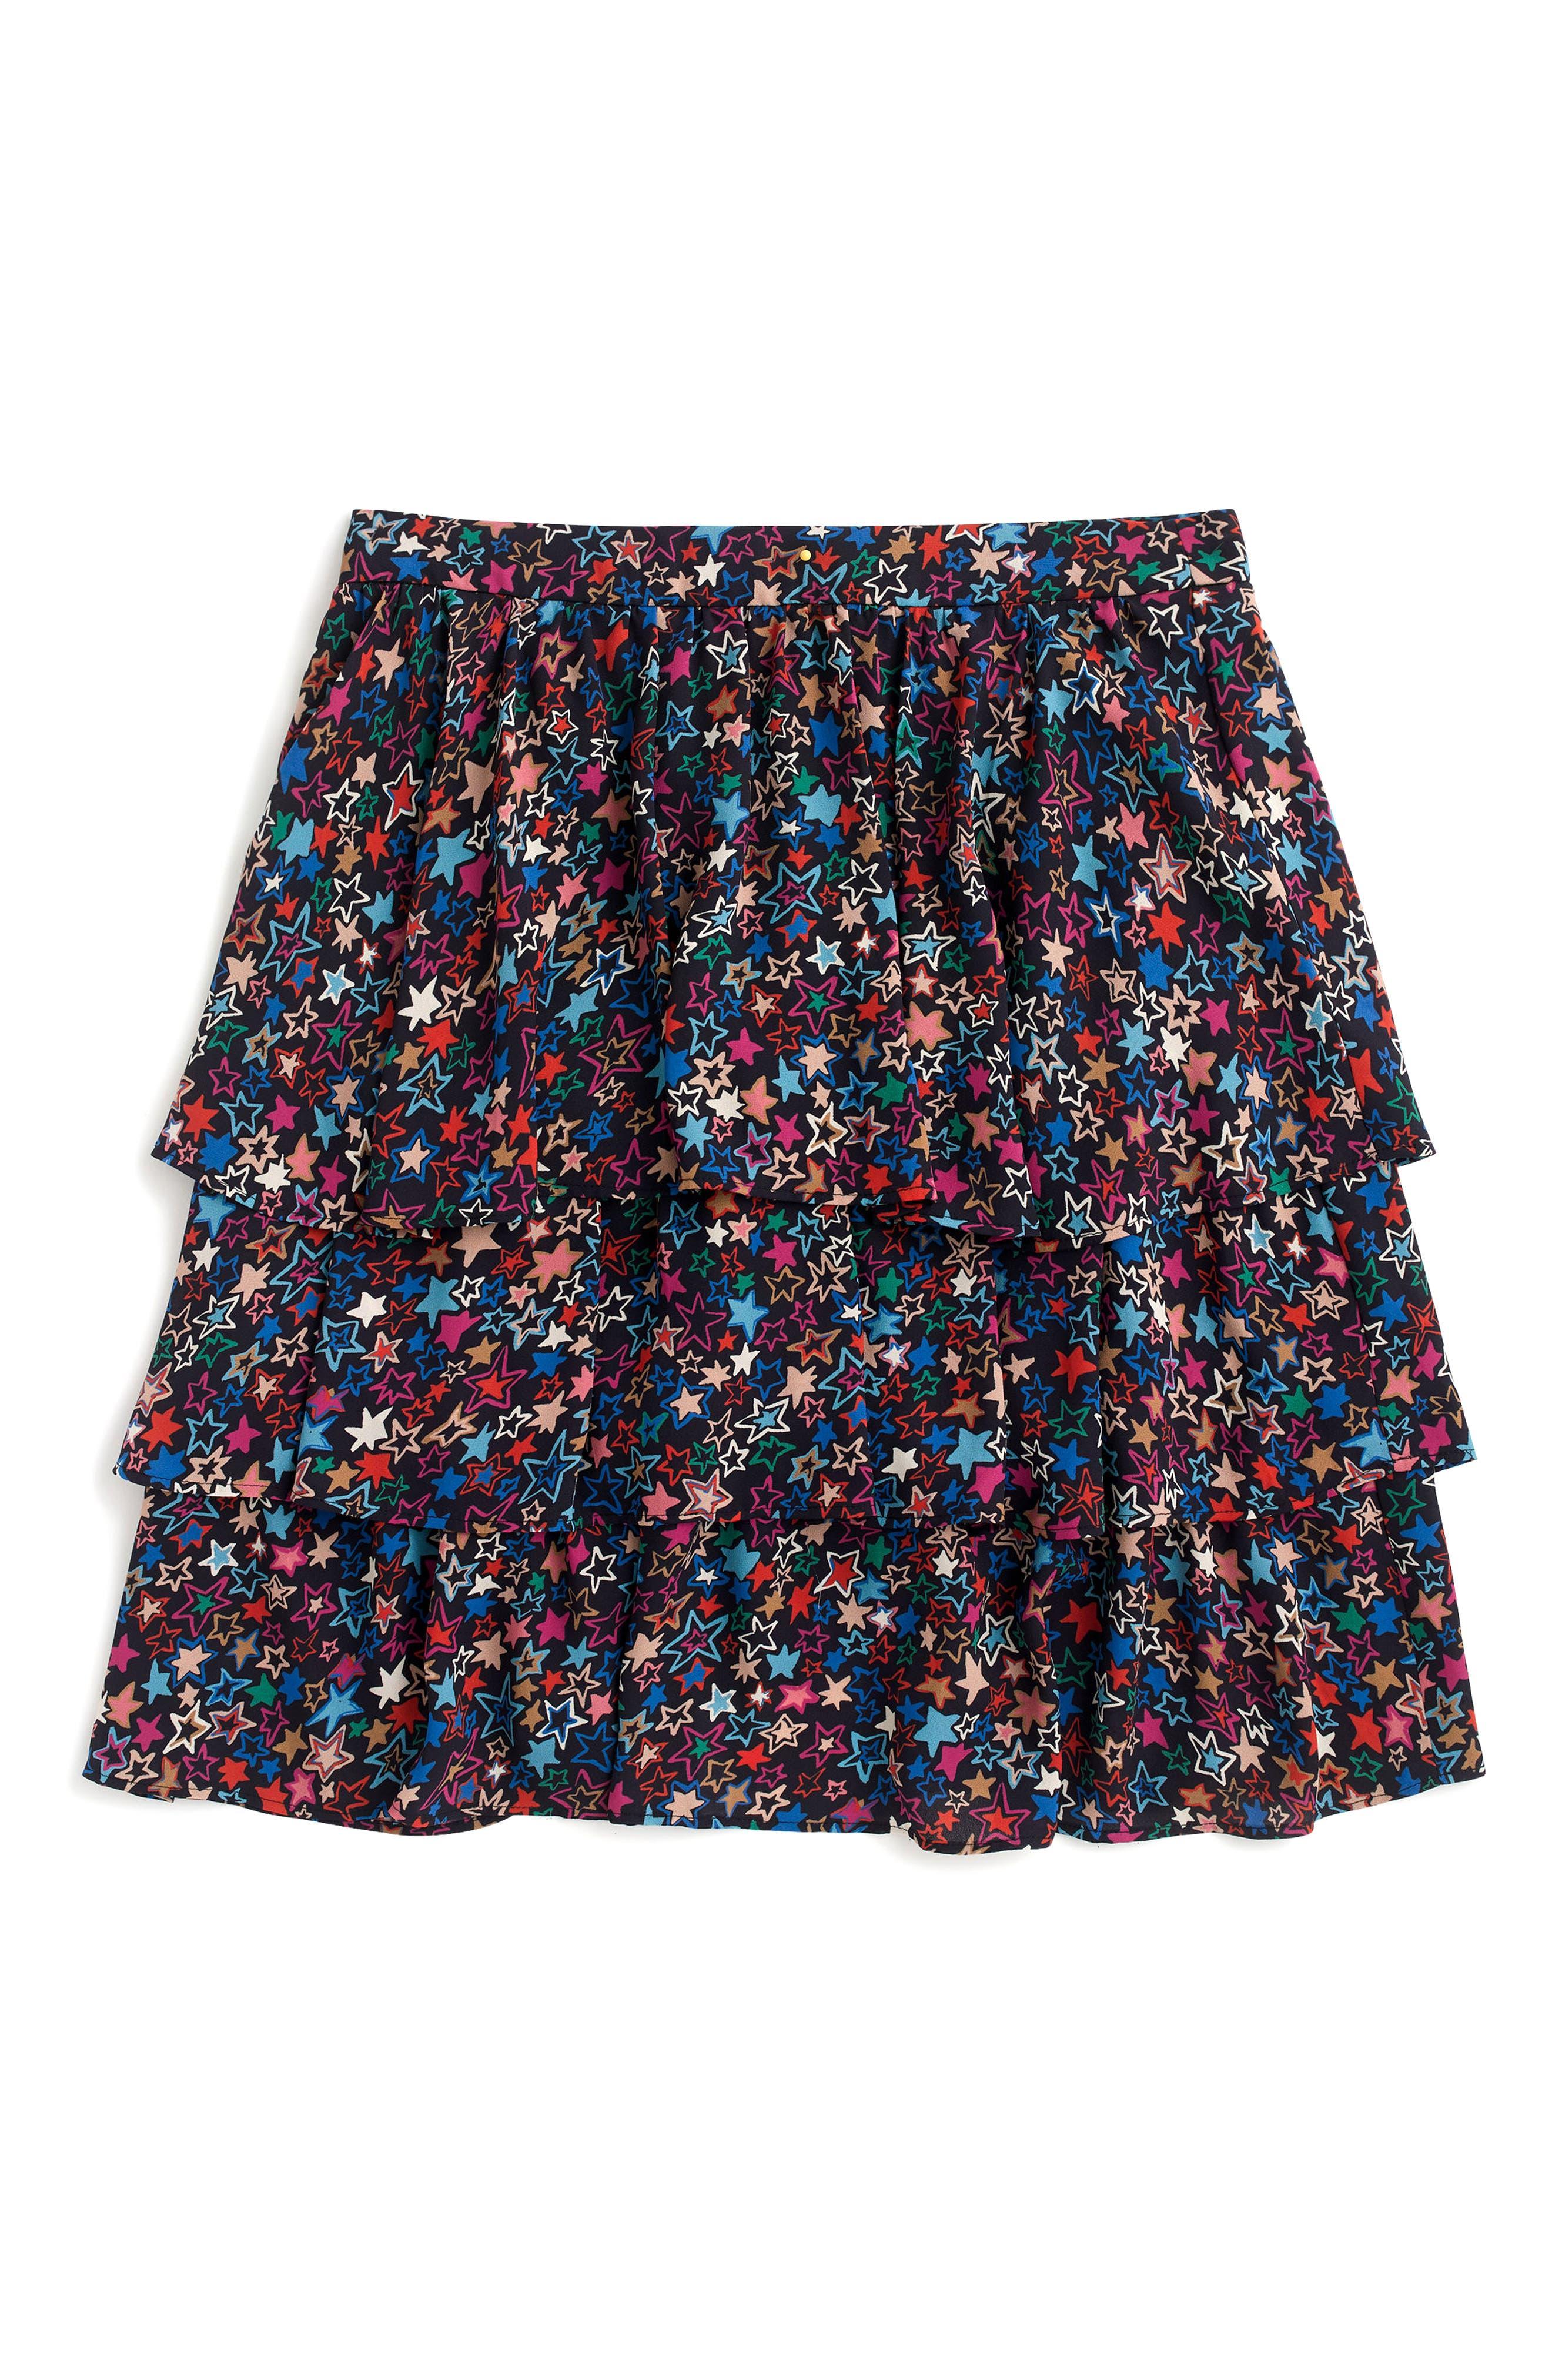 J.CREW,                             Star Print Tiered Skirt,                             Alternate thumbnail 4, color,                             409